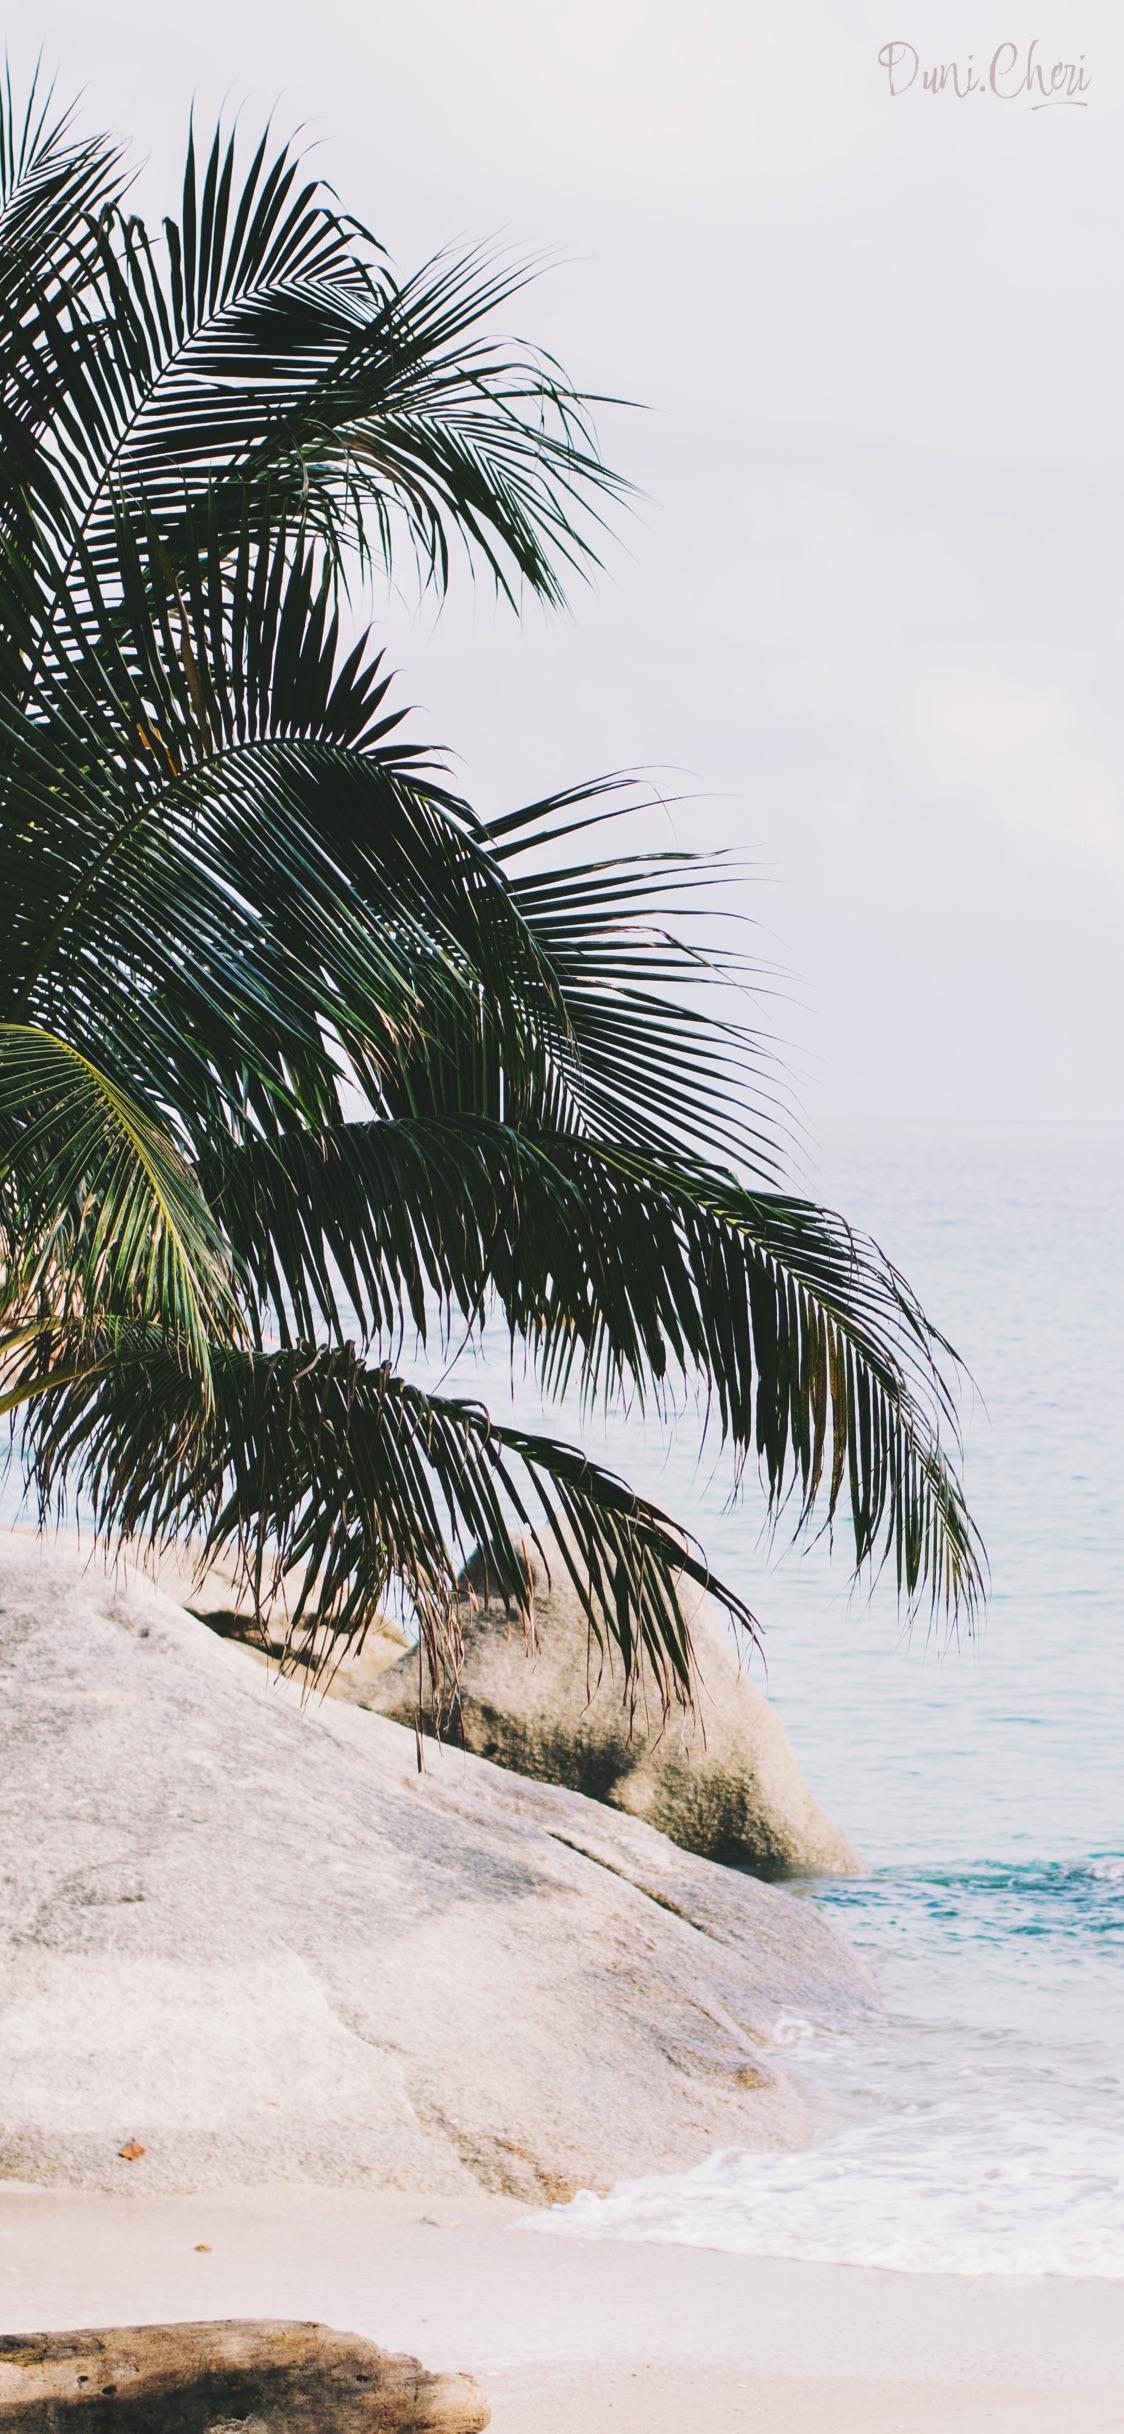 palme strand summer wallpaper iphone x 21   duni.cheri